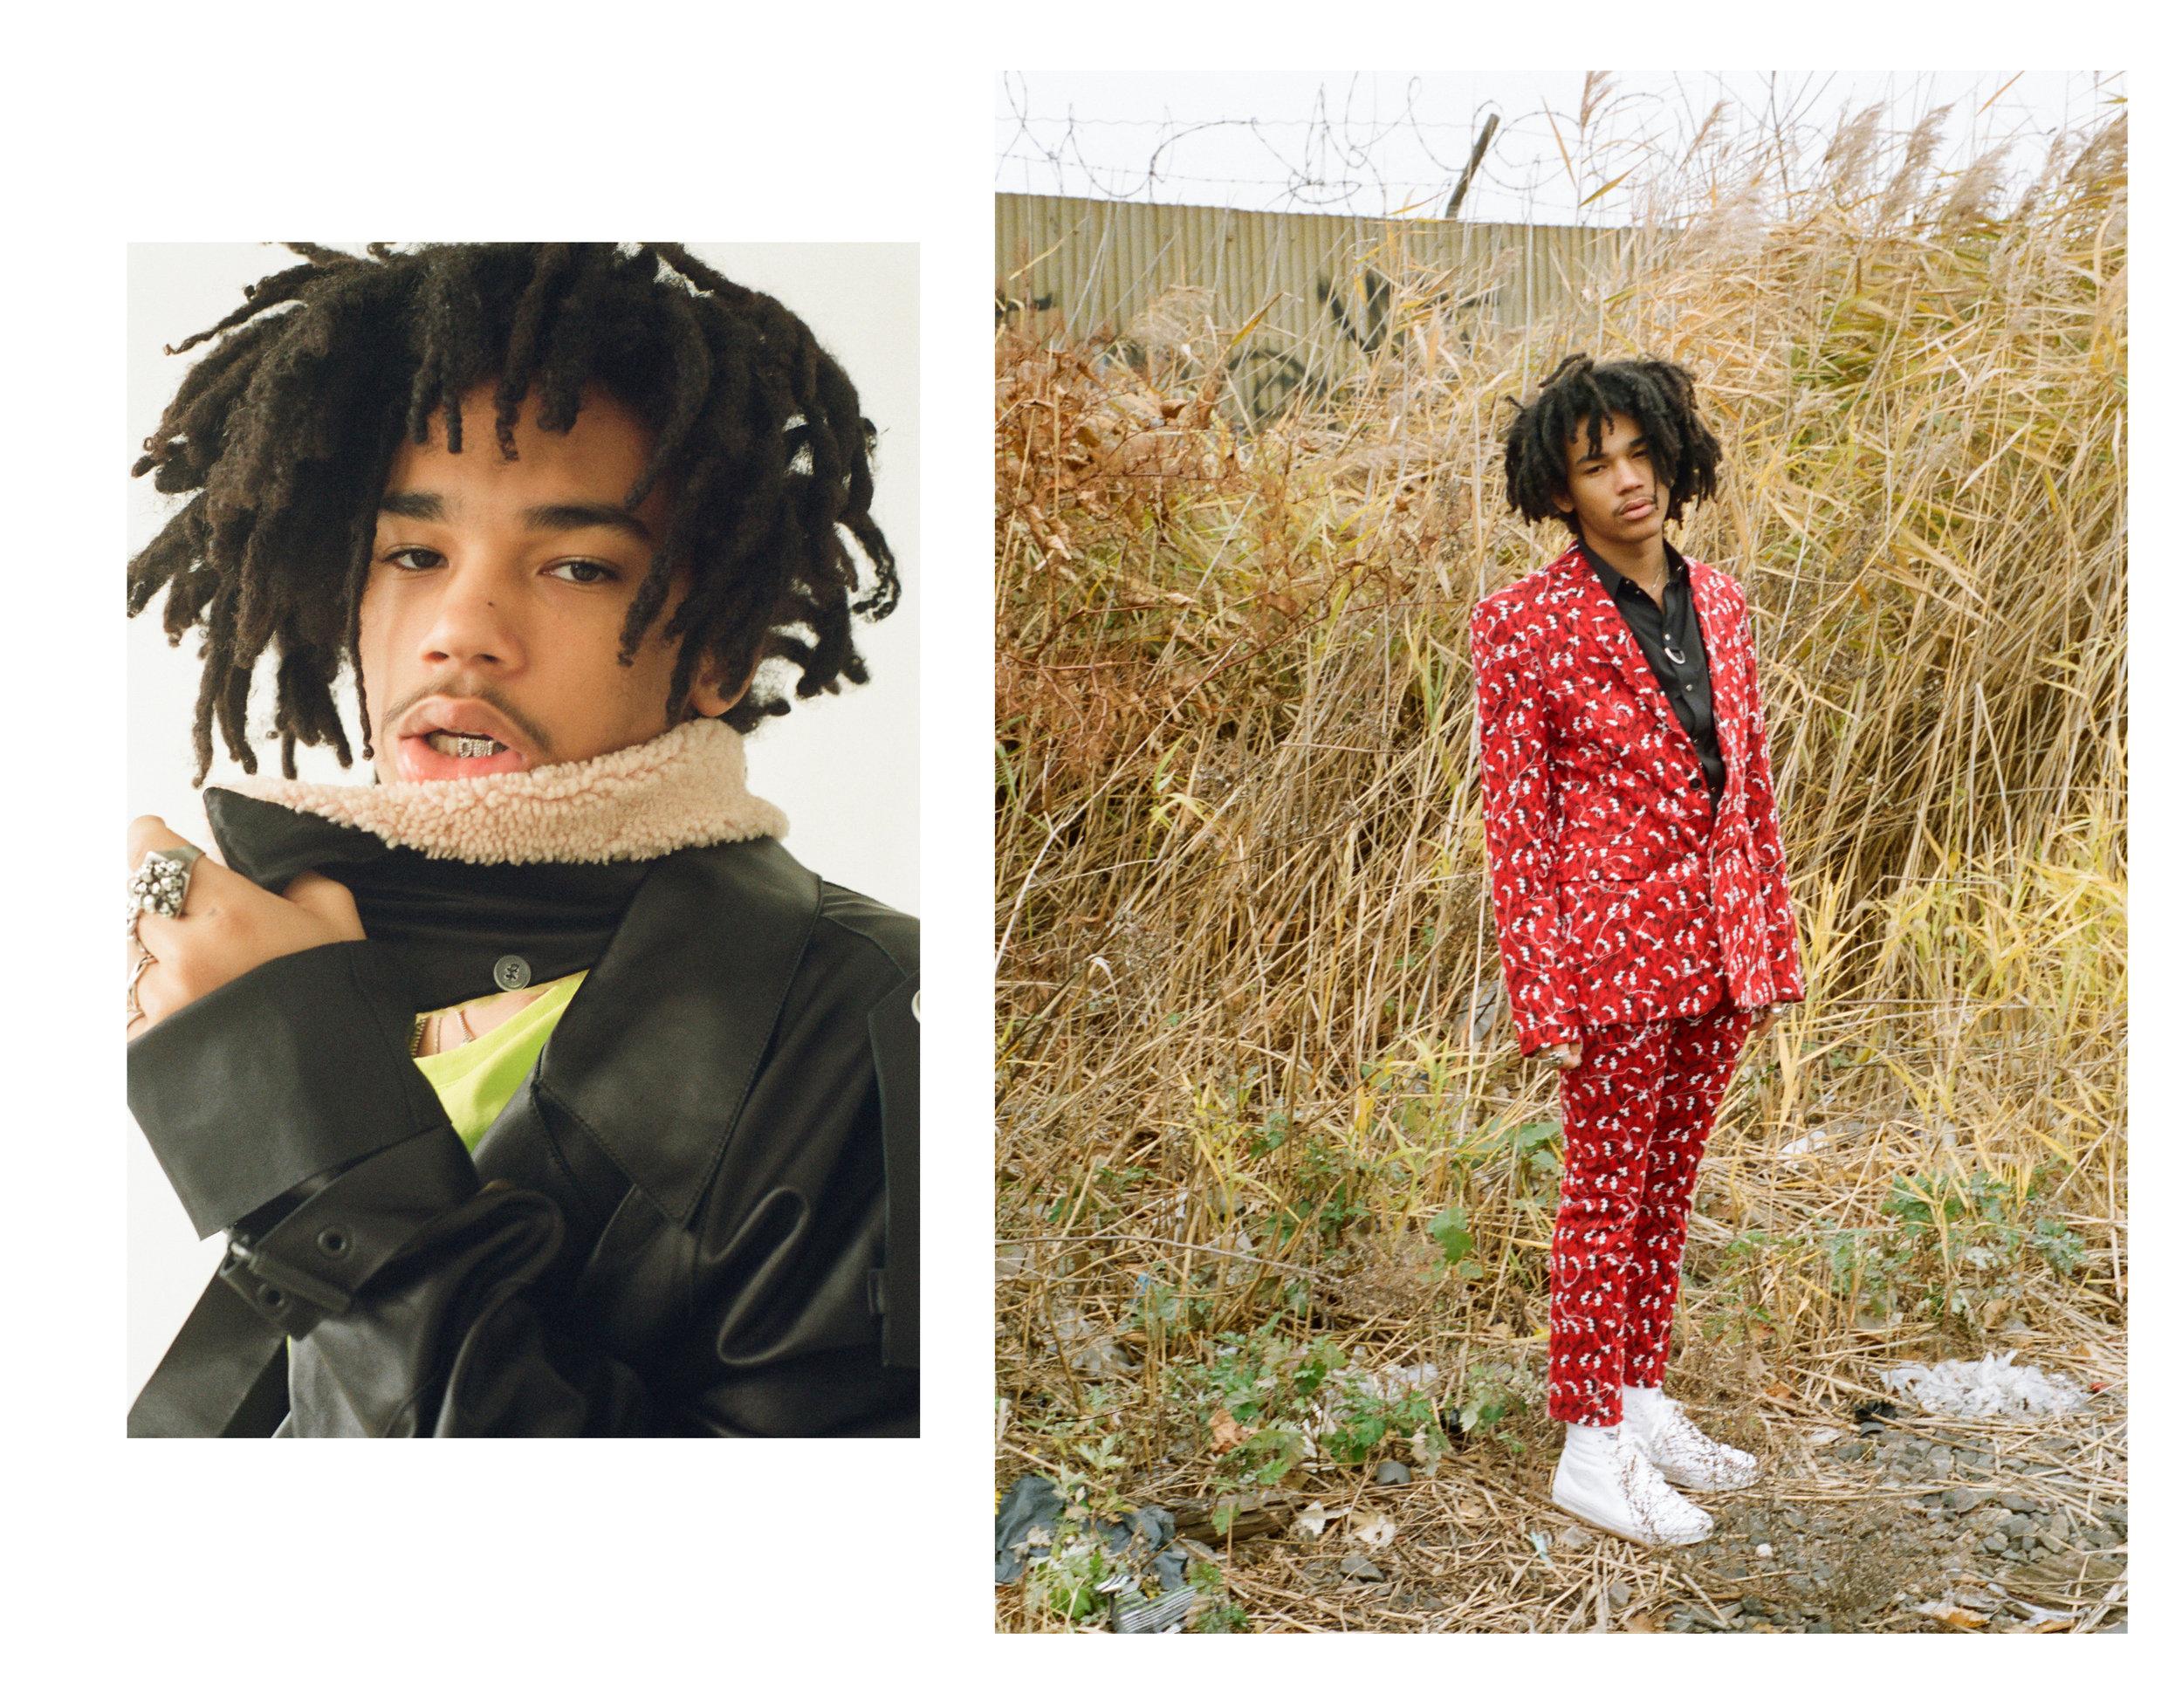 Luka Sabbat / Flaunt Magazine